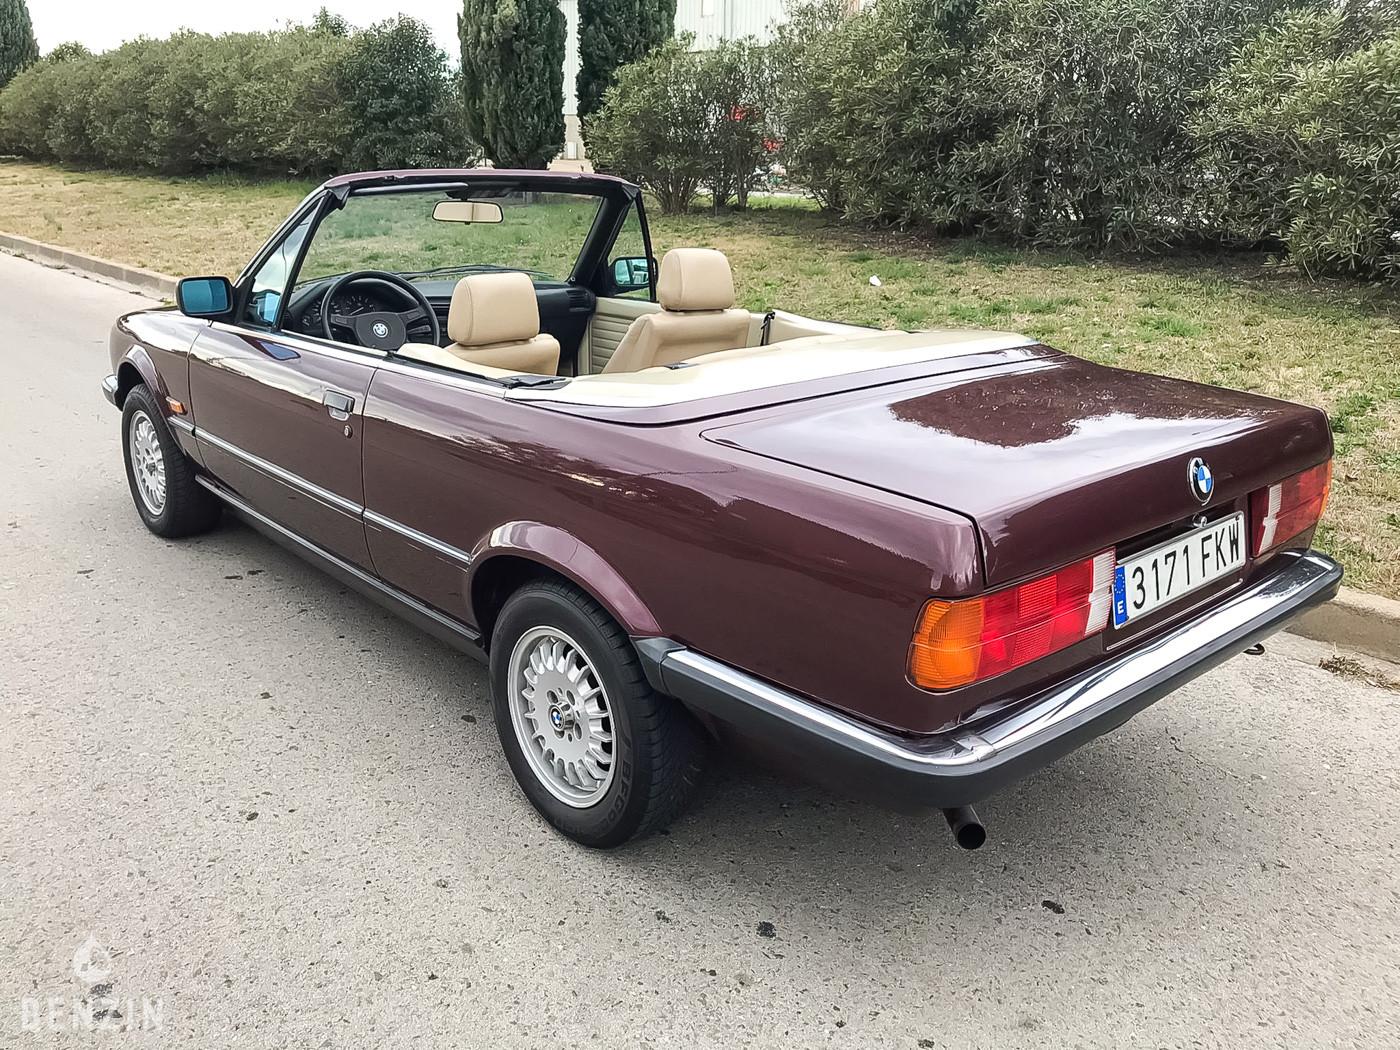 BMW 320I cabriolet à vendre/ BMW 320I to sell/ BMW 320I cabriolet verkaufen/ BMW 320I en venta